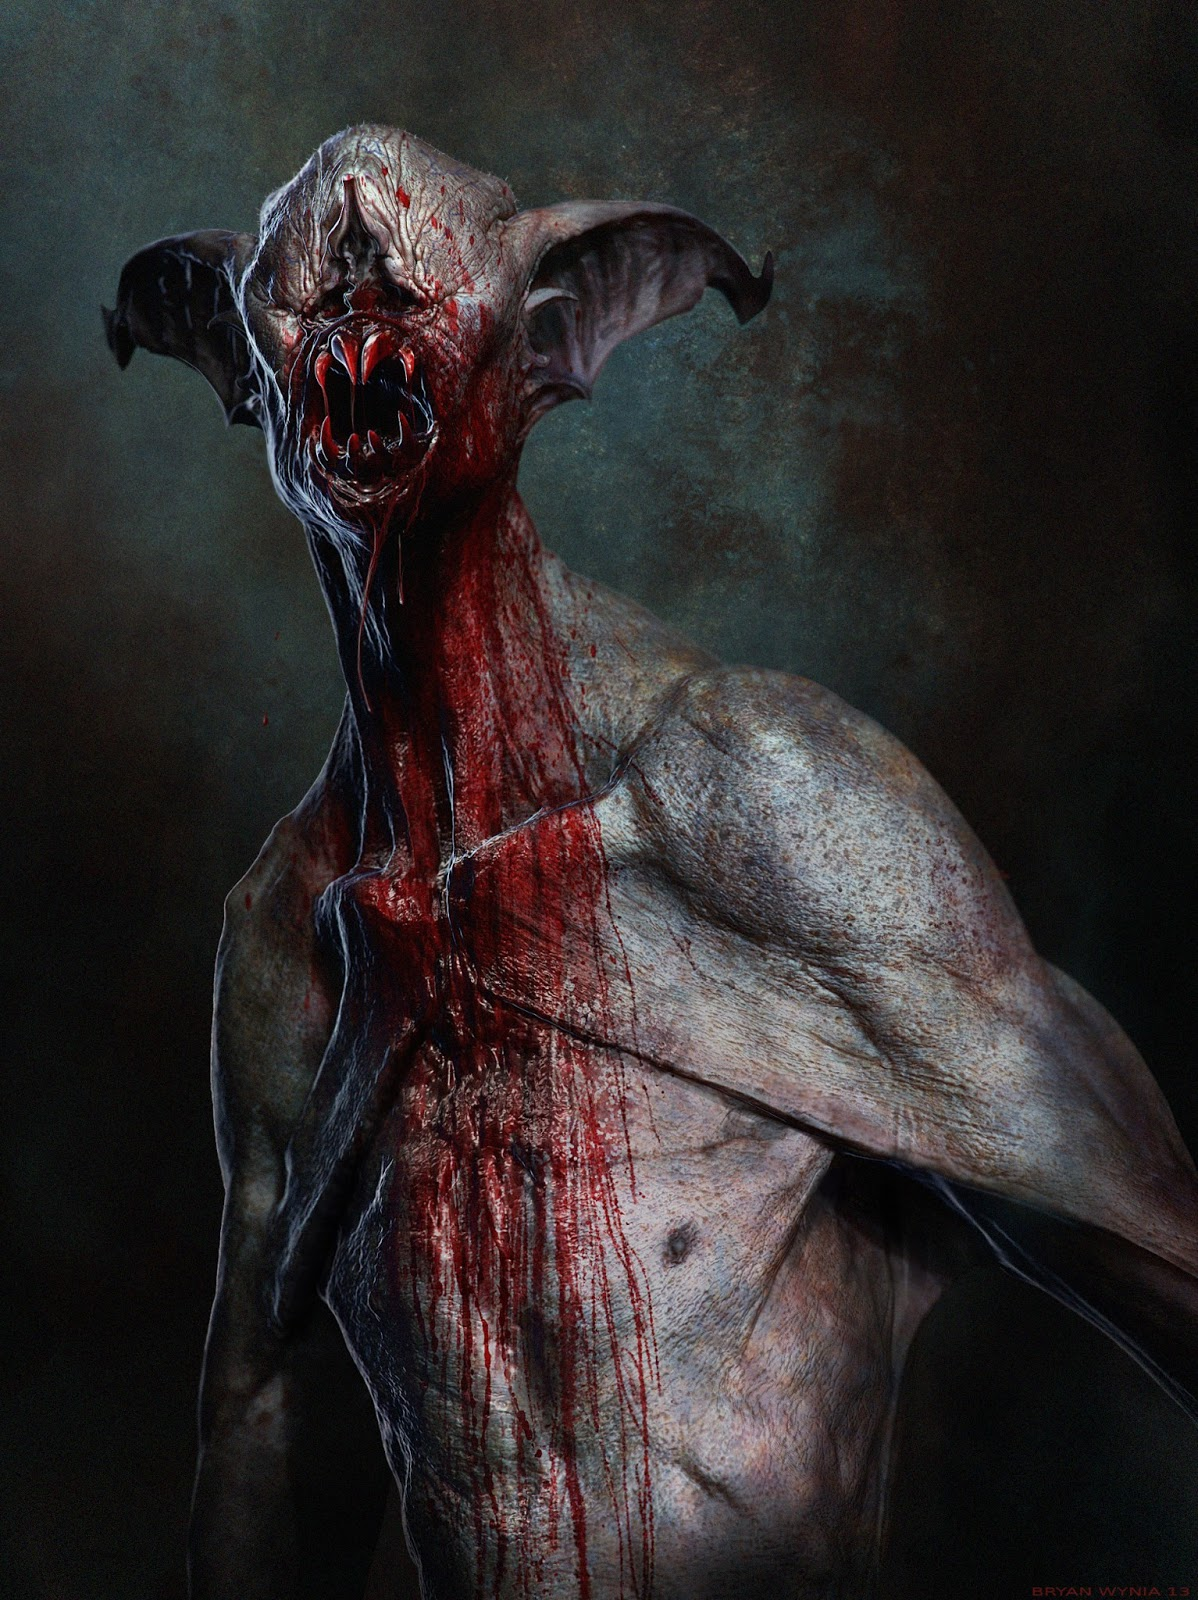 the ashen knight vampire pdf squid